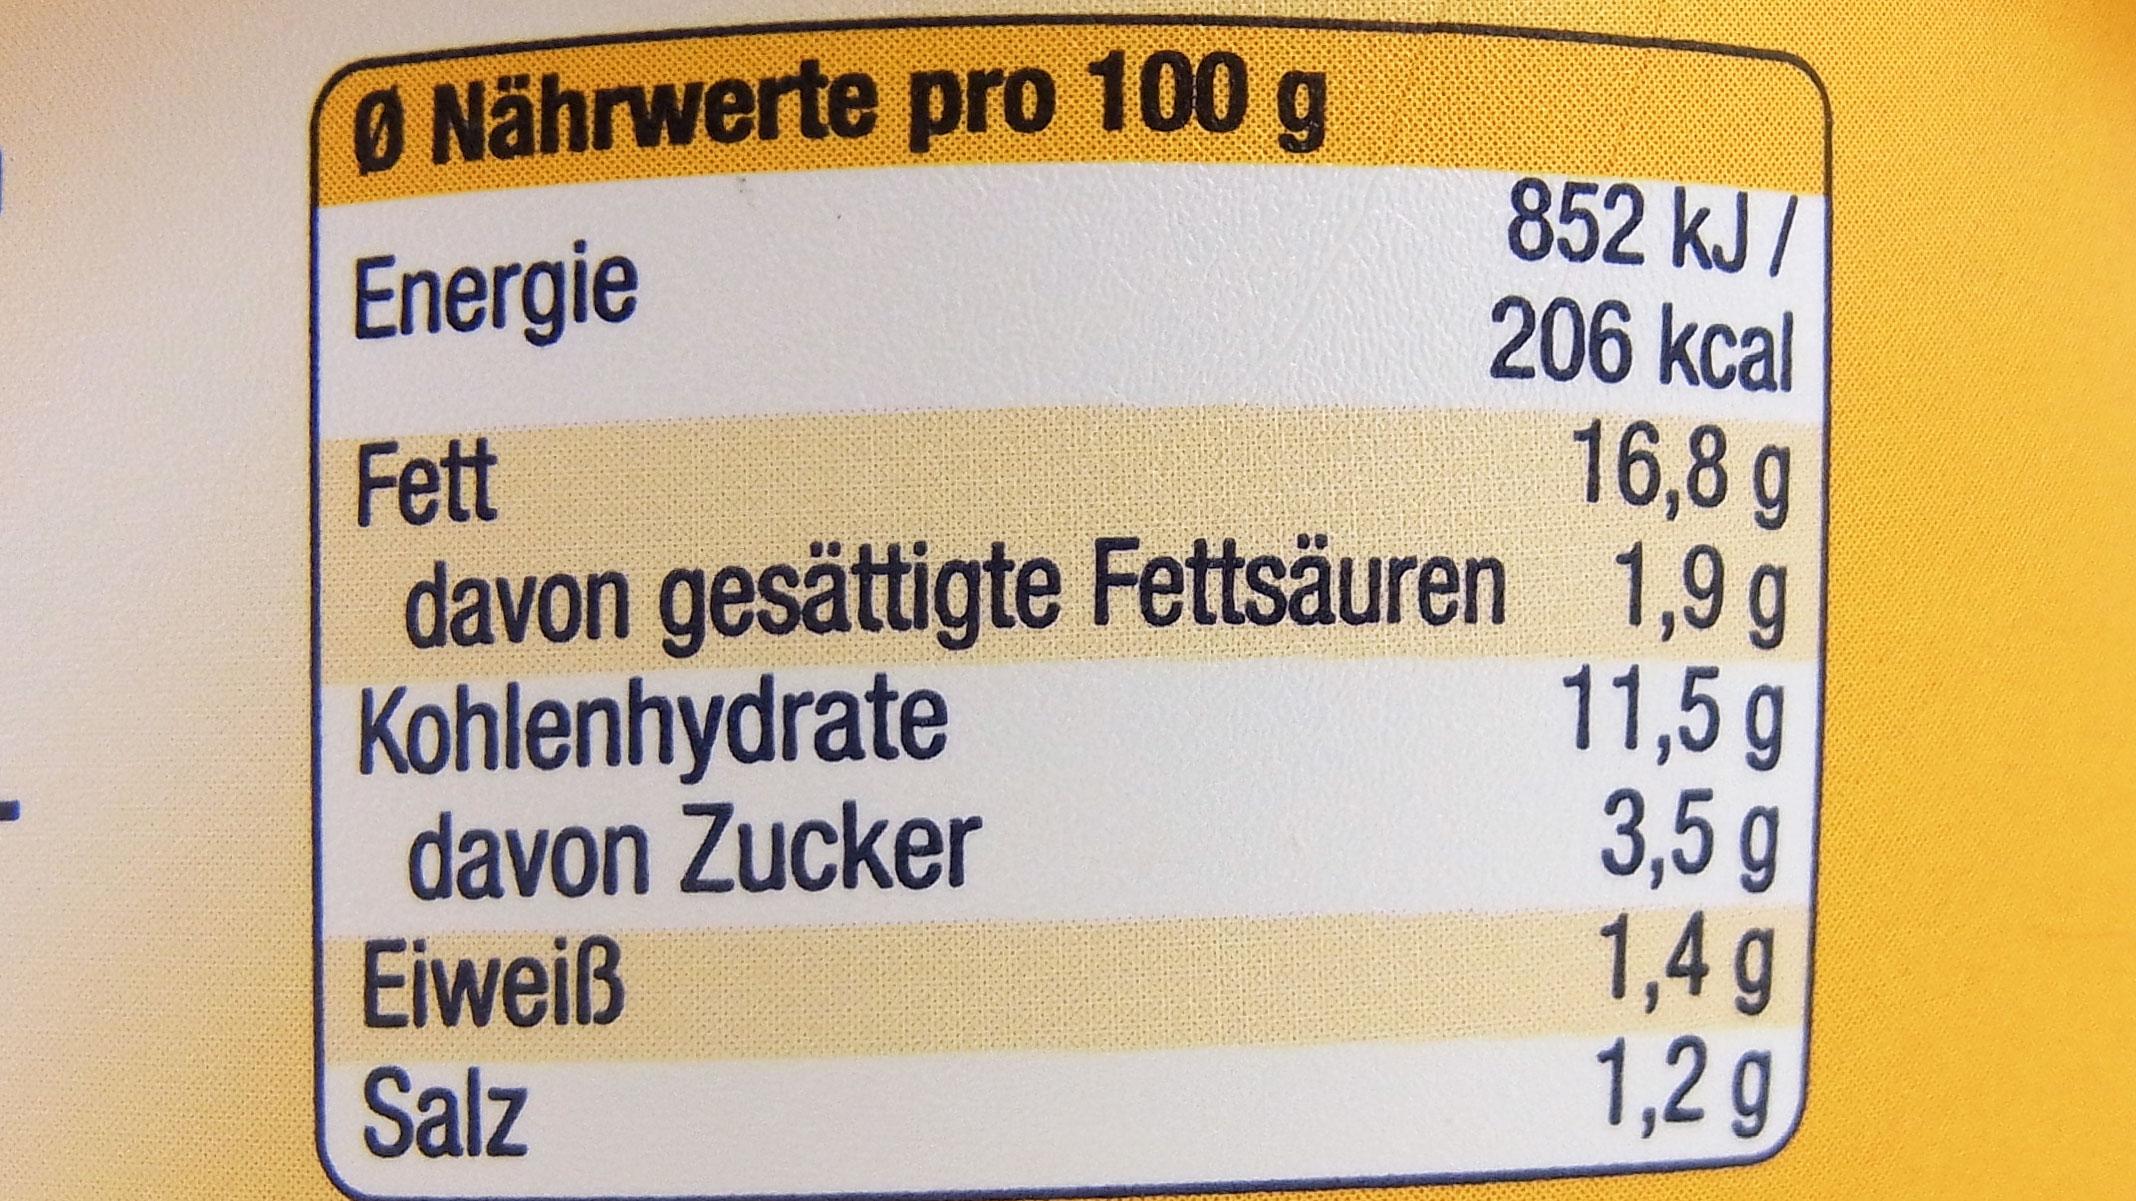 Angaben Kohlenhydrate 10 G Davon Zucker 6 G Lebensmittelklarheit